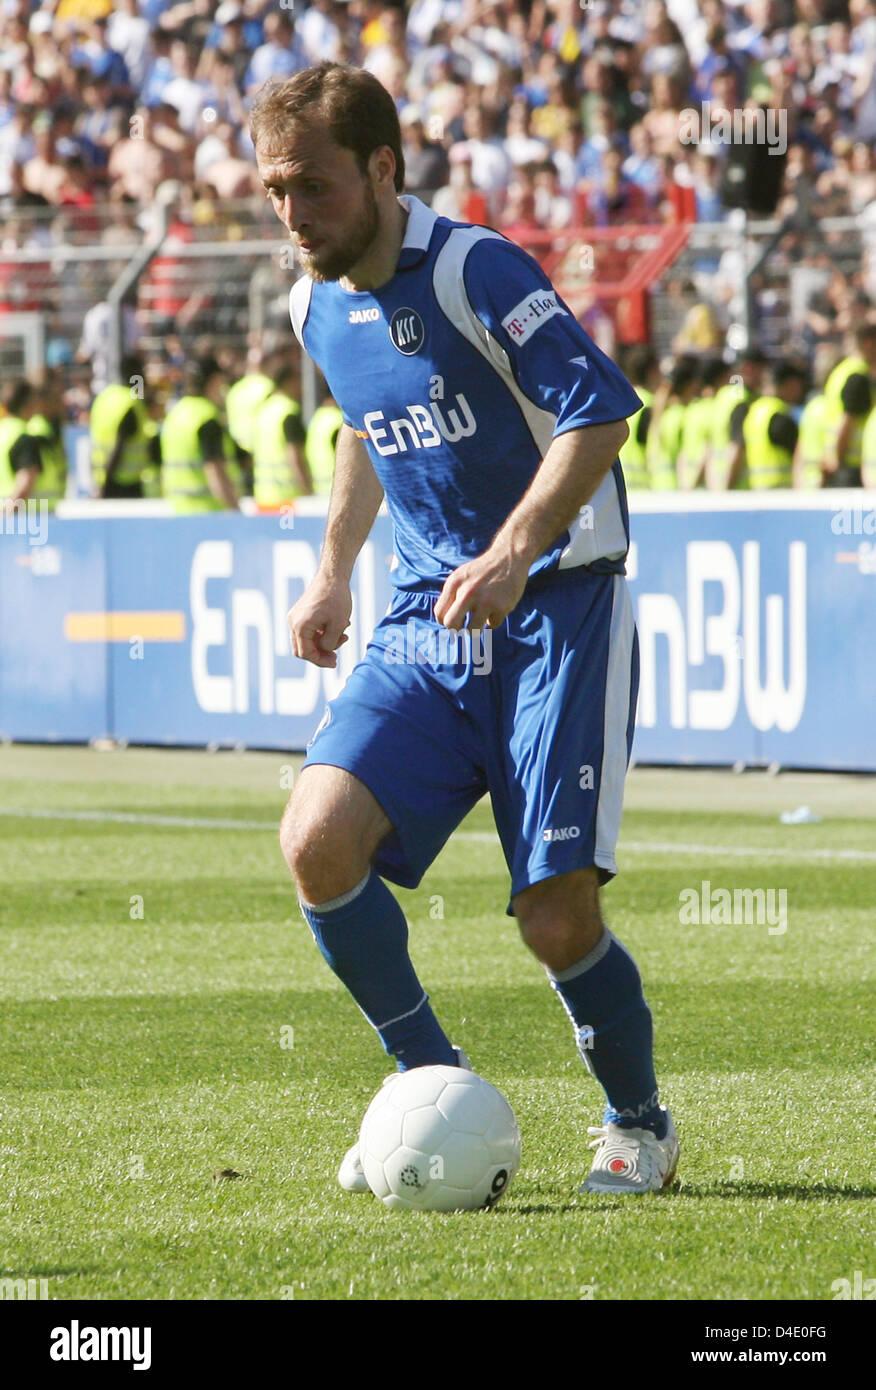 Alex Bochum iashvili of karlsruhe is on the in the bundesliga